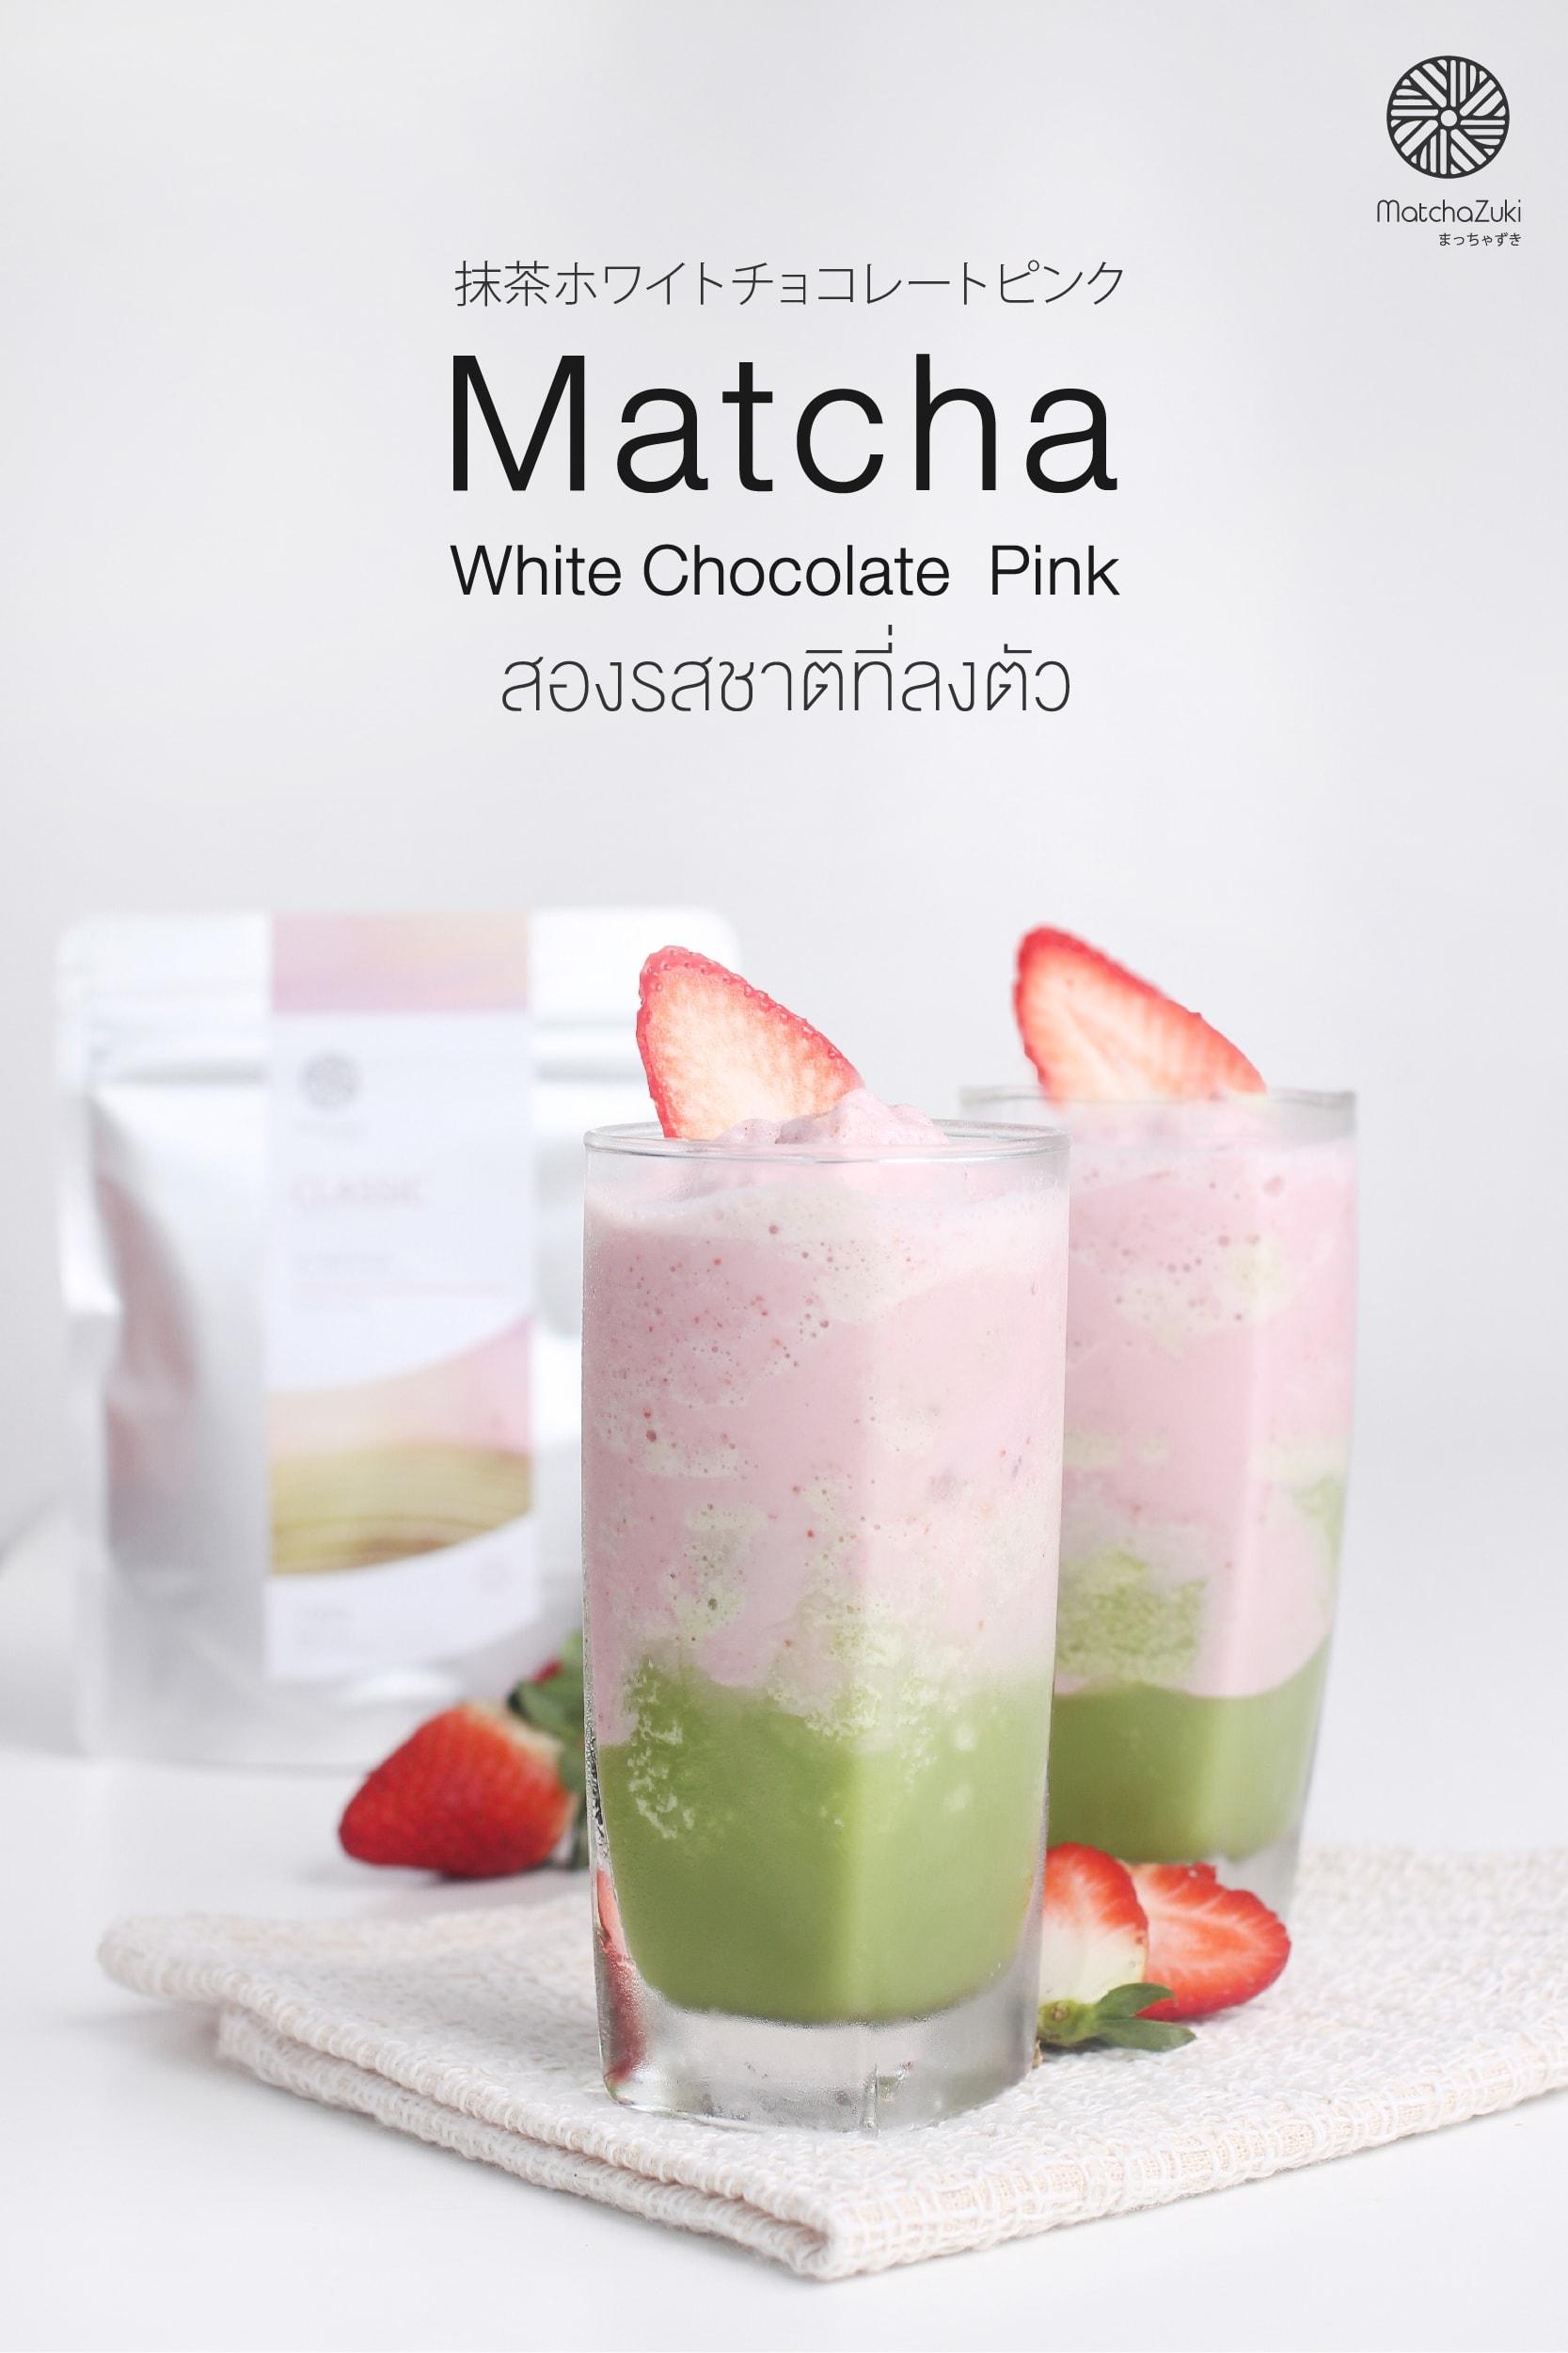 Matcha White Chocolate Pink